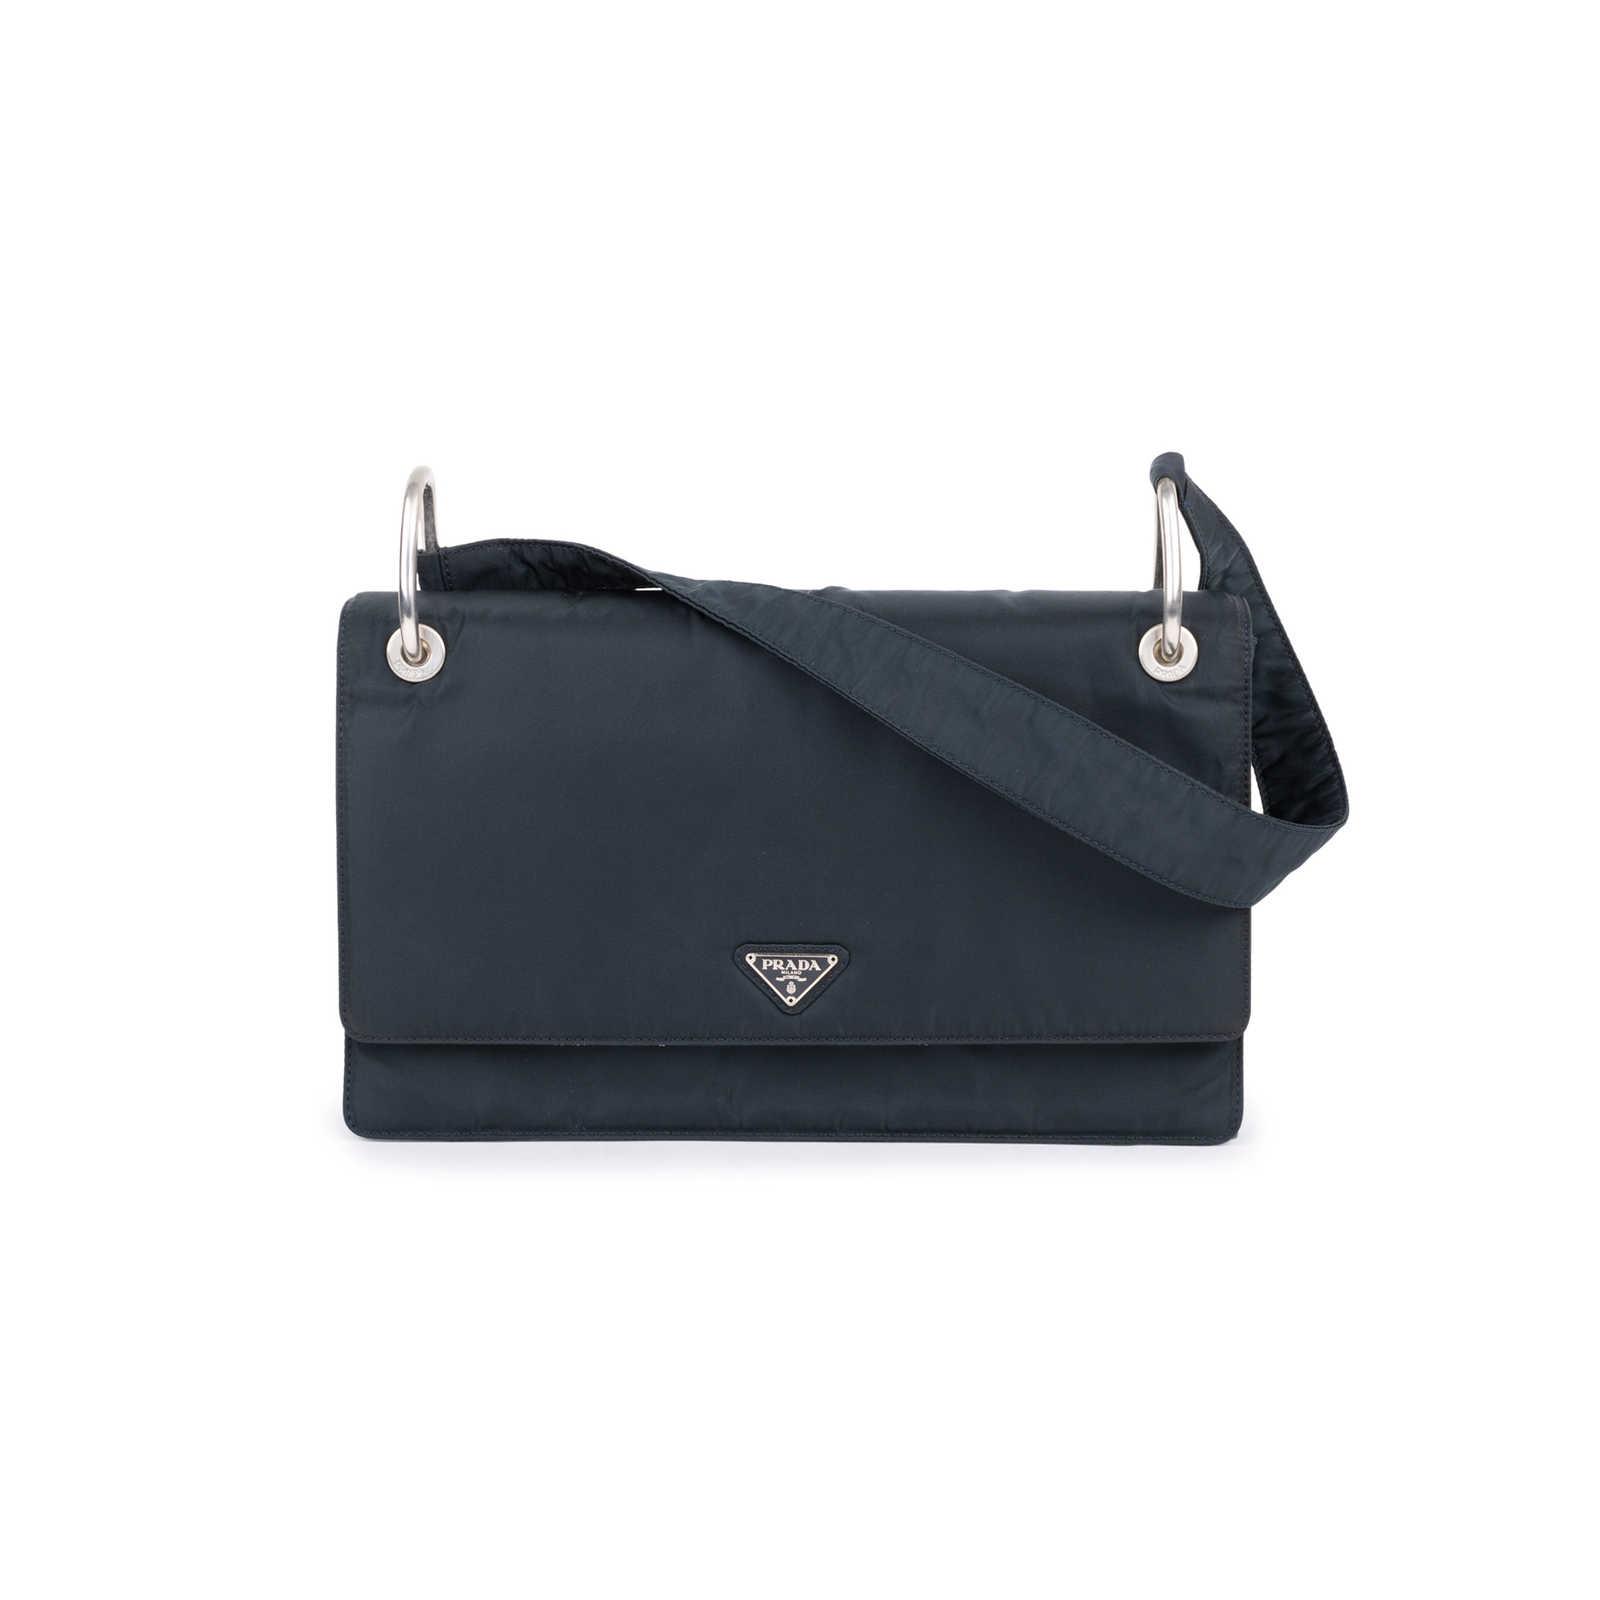 70a084d18bed Authentic Second Hand Prada Borsa Tessuto Shoulder Bag (PSS-594-00018) ...